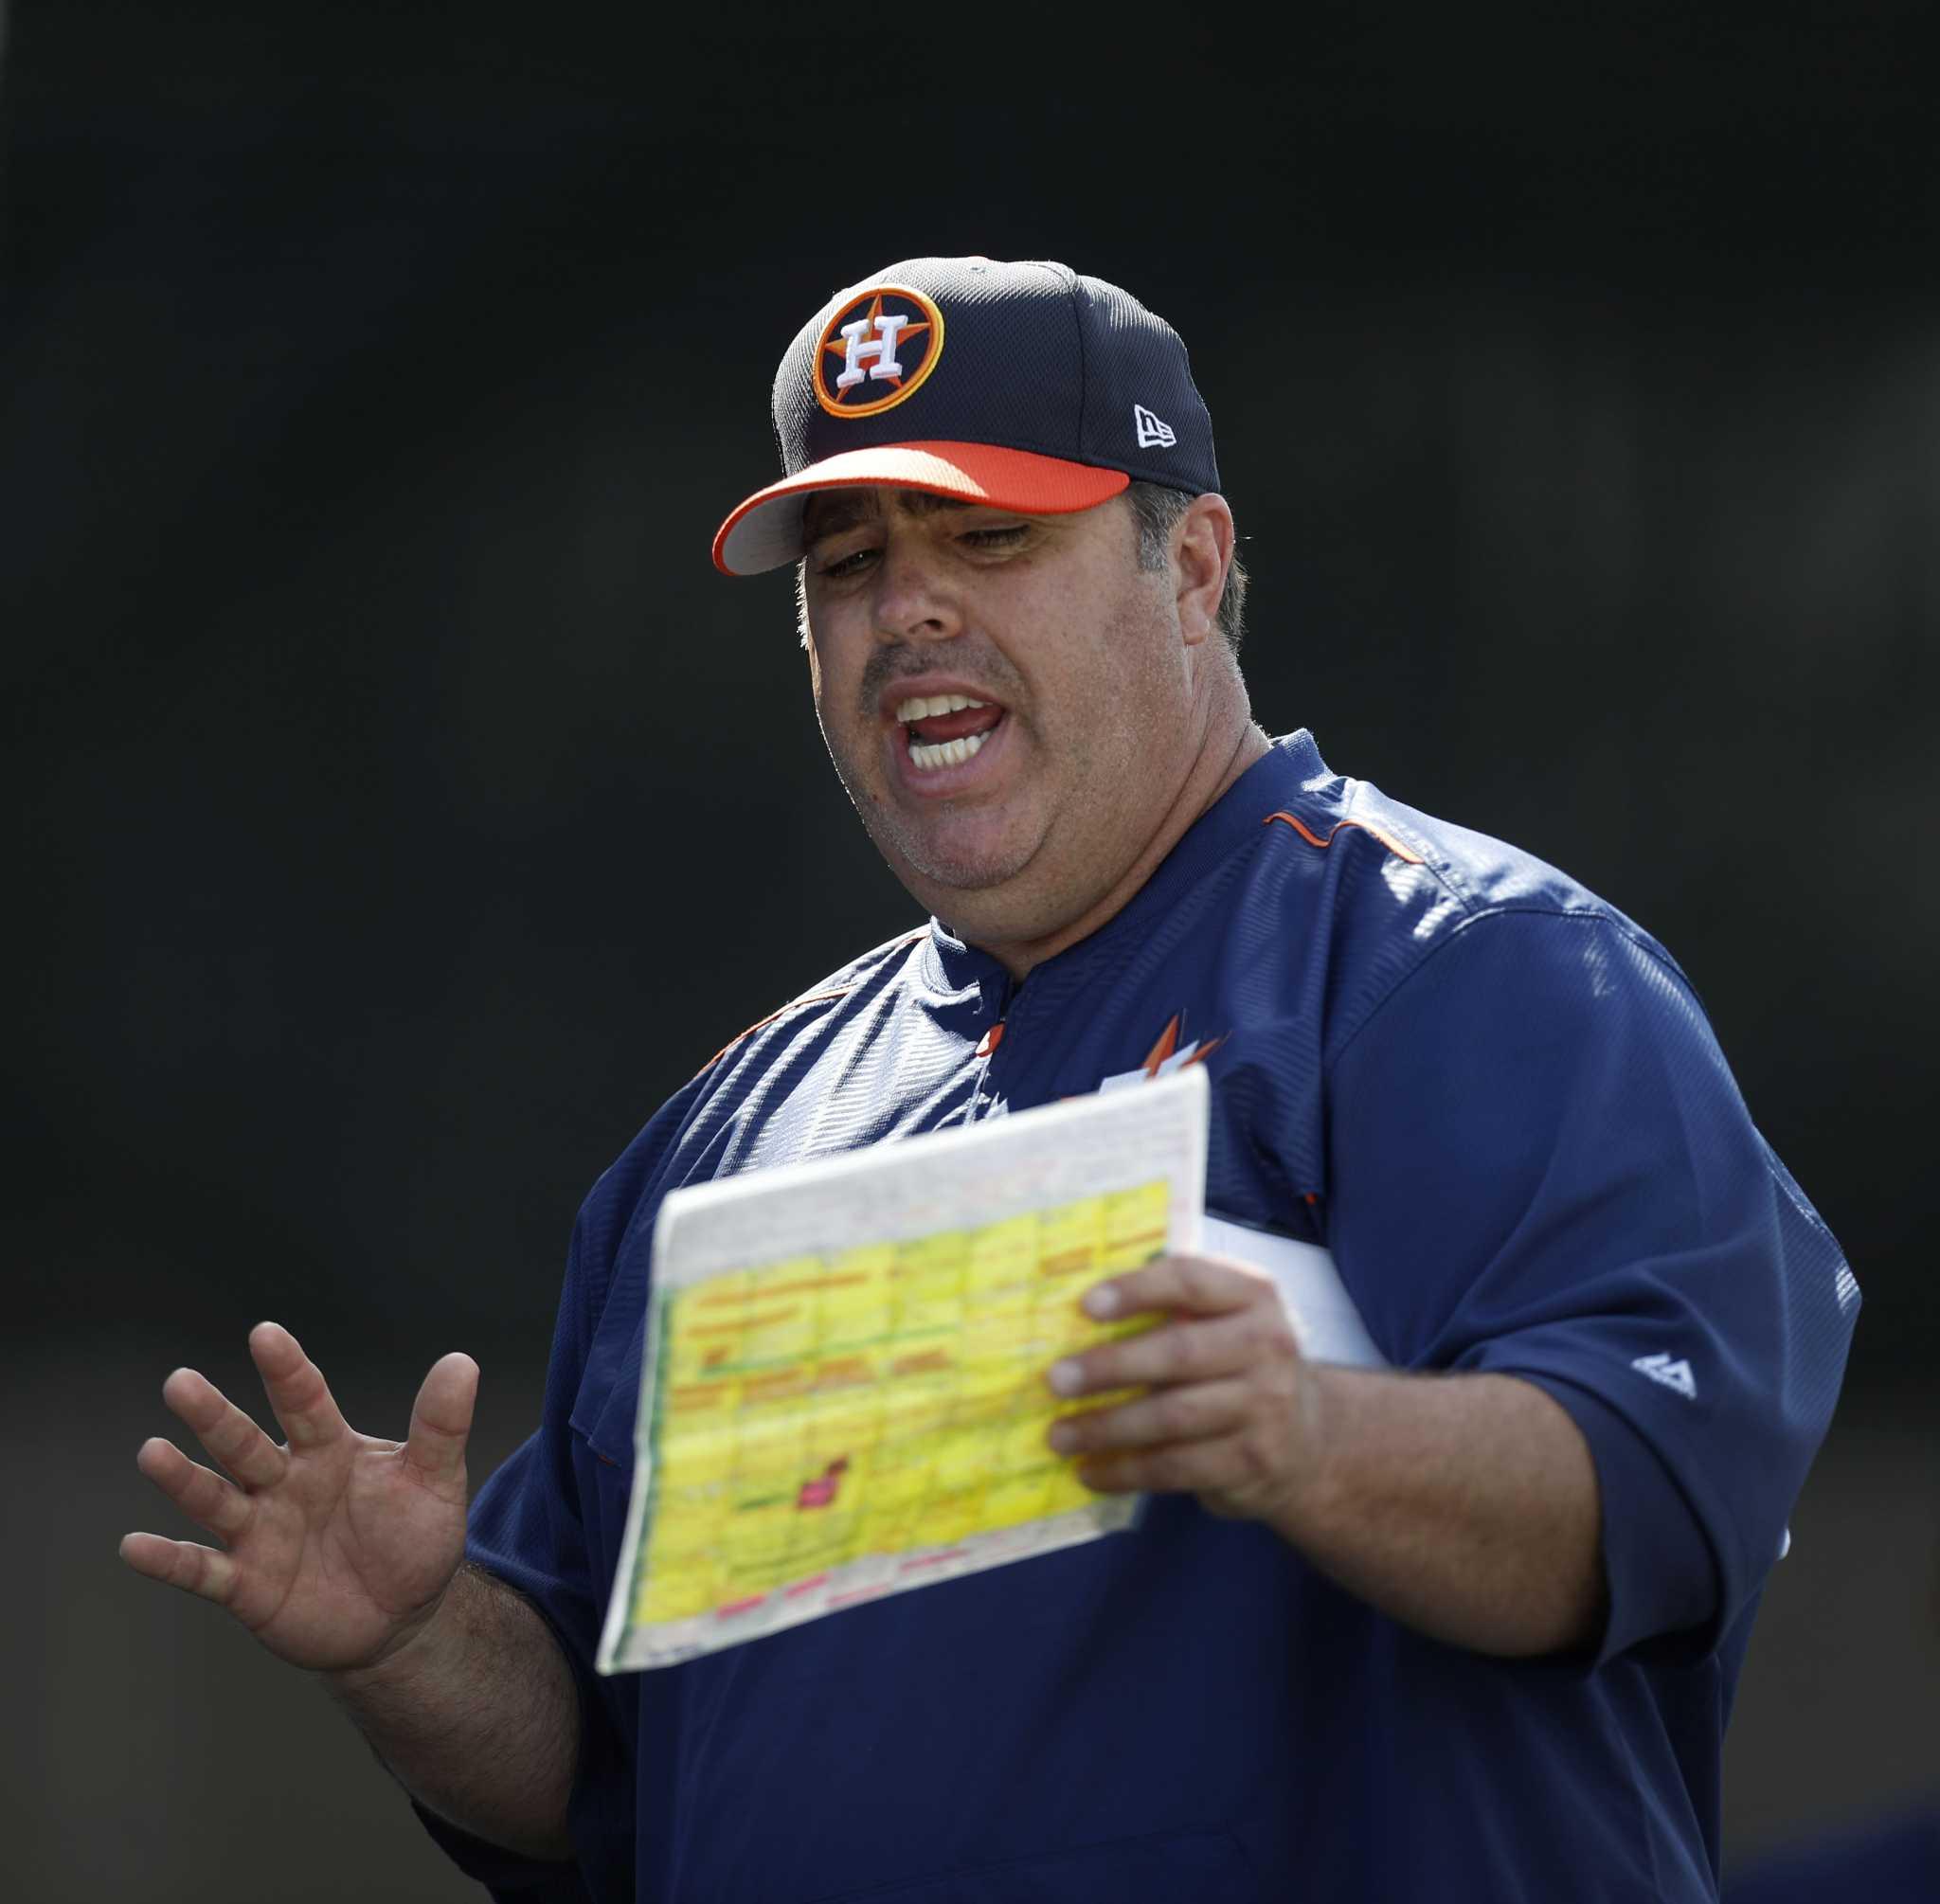 Housing Authority West Palm Beach: Report: Ex-Astros Bullpen Coach Craig Bjornson Hired By